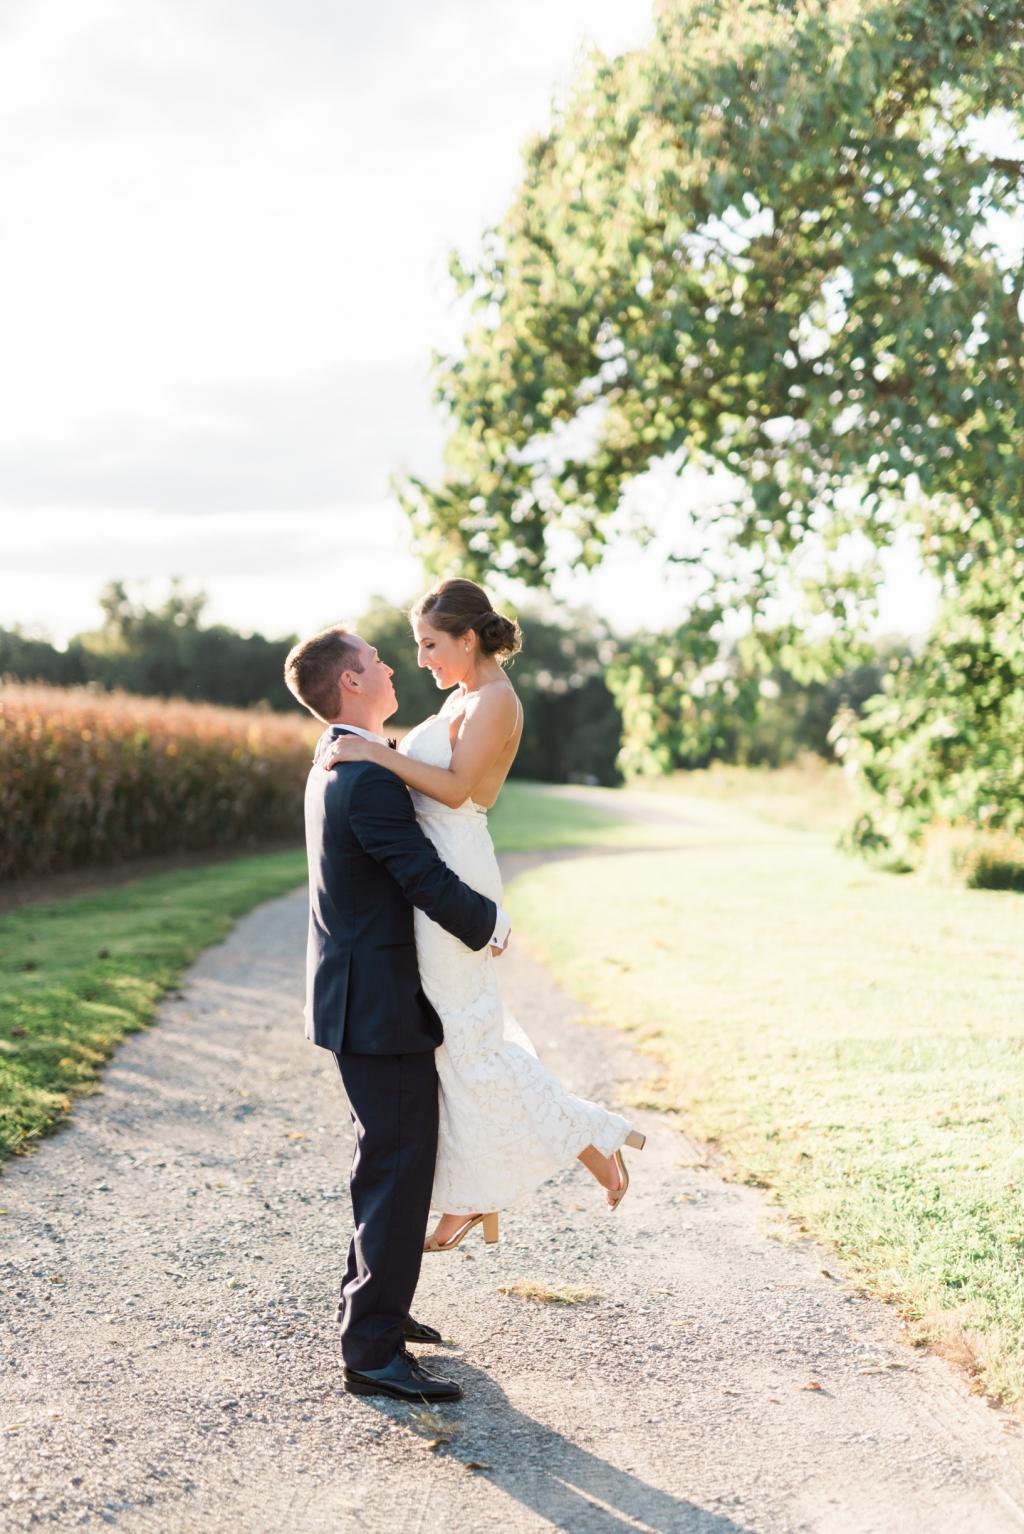 haley-richter-photography-buena-vista-confrence-center-wedding-summer-151